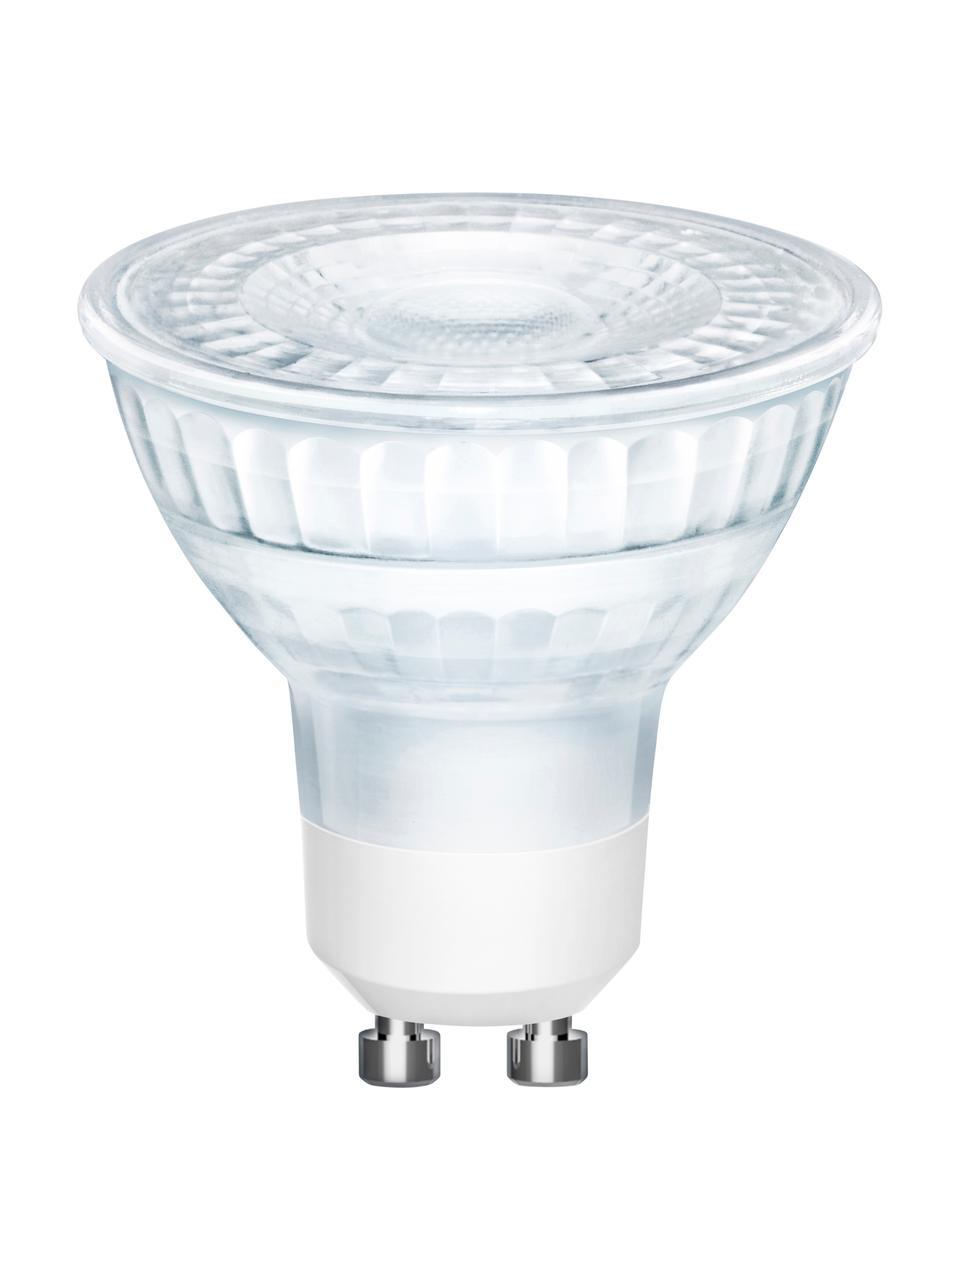 GU10 Leuchtmittel, 5W, dimmbar, warmweiß, 1 Stück, Leuchtmittelschirm: Glas, Leuchtmittelfassung: Aluminium, Transparent, Ø 5 x H 6 cm